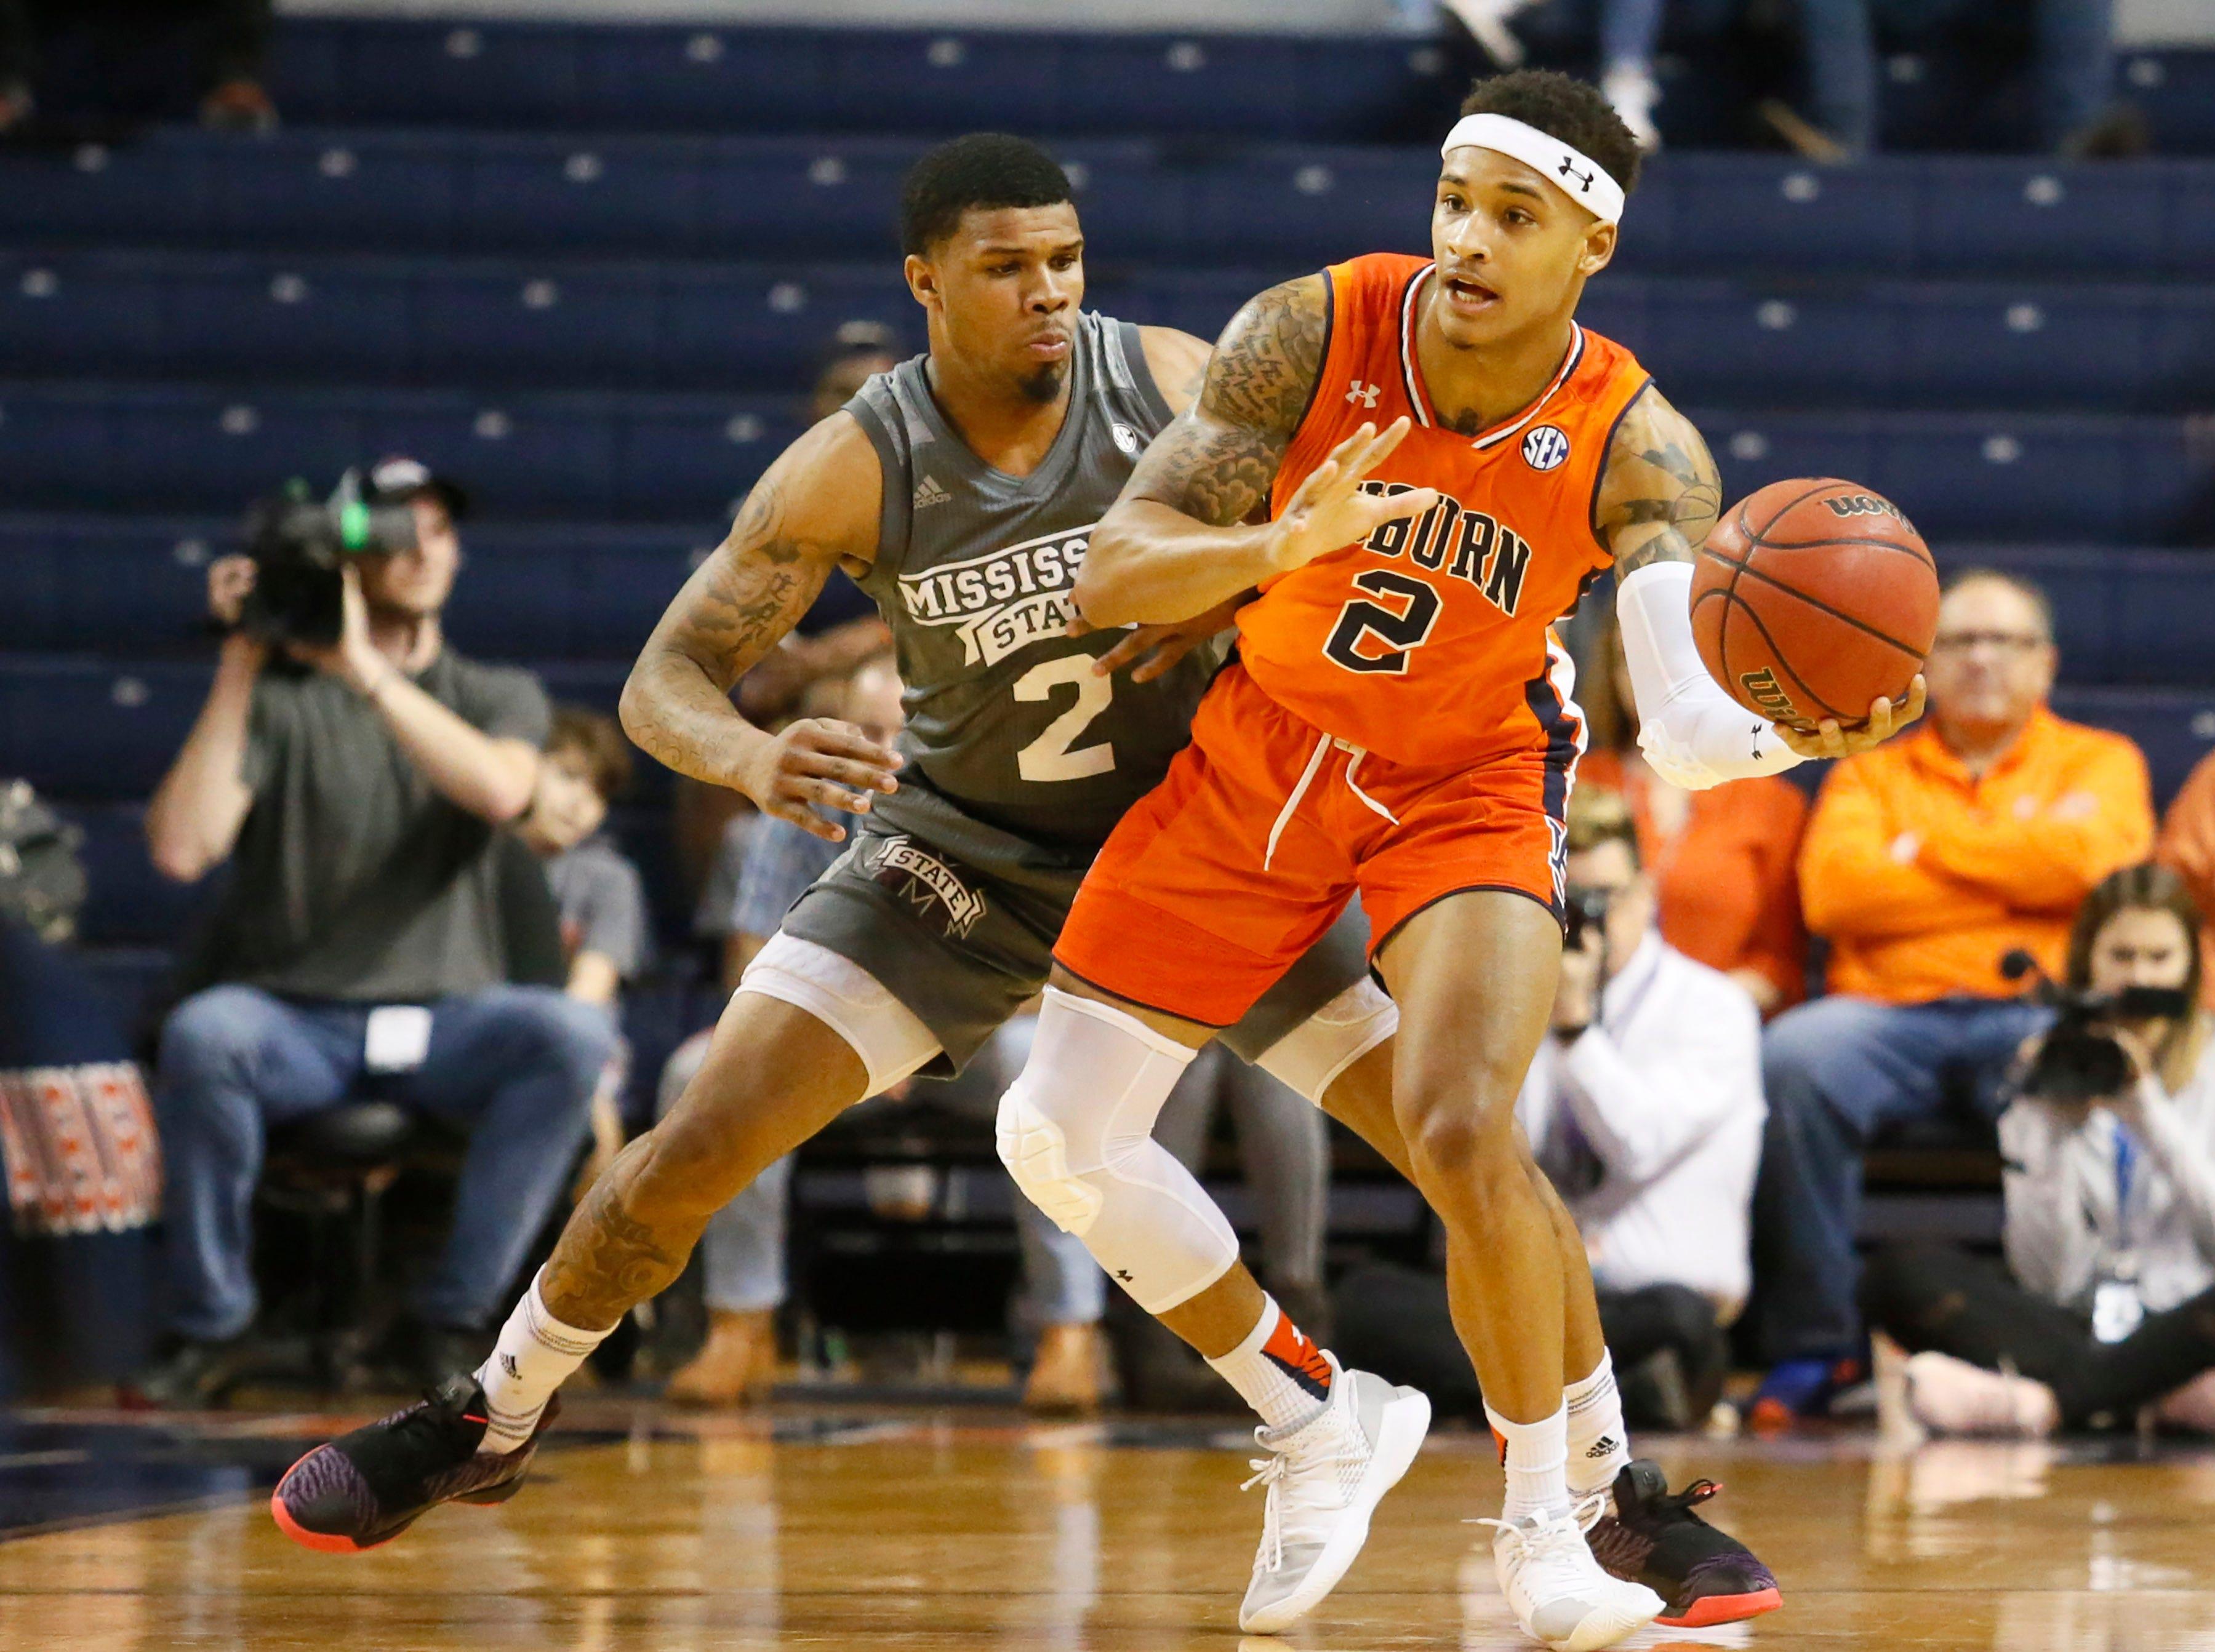 Mar 2, 2019; Auburn, AL, USA; Mississippi State Bulldogs guard Lamar Peters (2) pressures Auburn Tigers guard Bryce Brown (2) during the first half at Auburn Arena. Mandatory Credit: John Reed-USA TODAY Sports